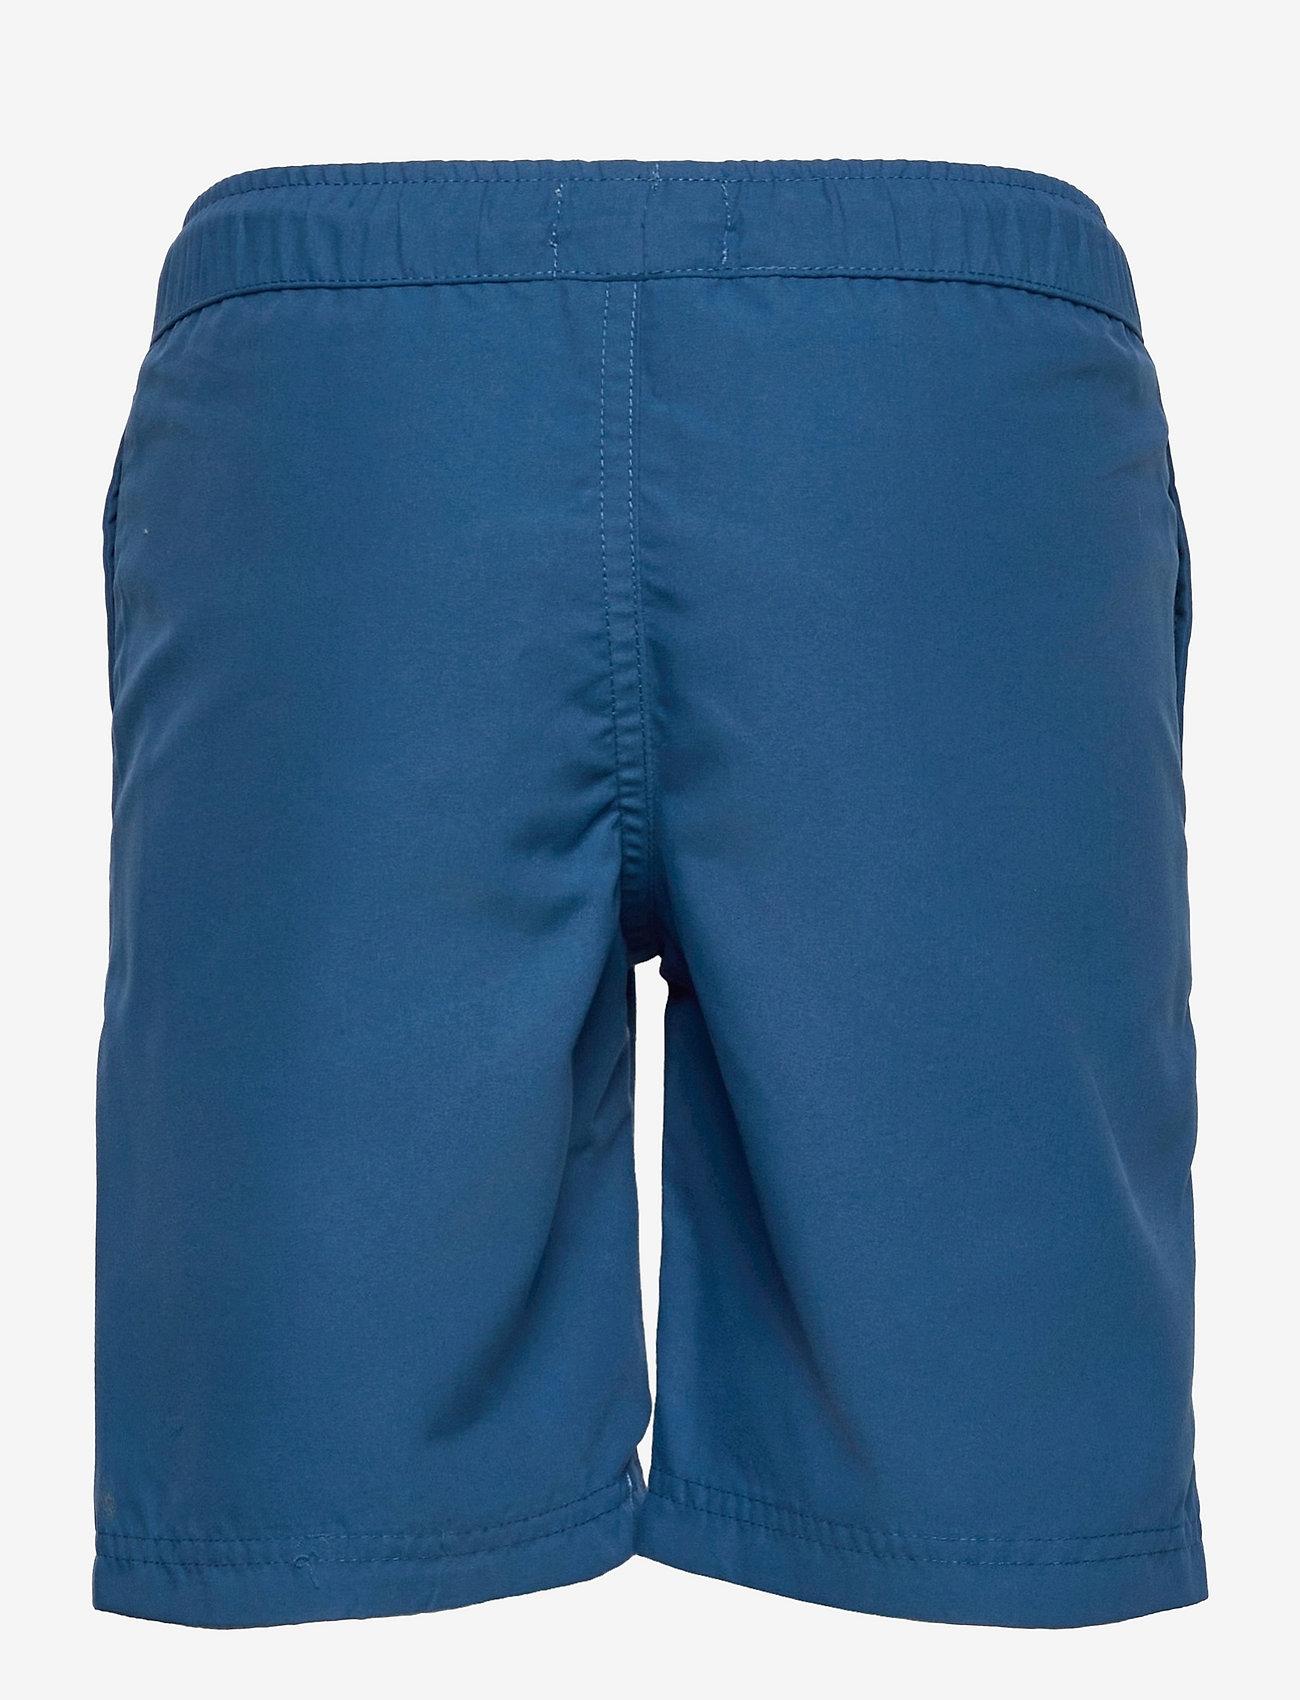 Timberland - SWIM SHORTS - badehosen - blue - 1